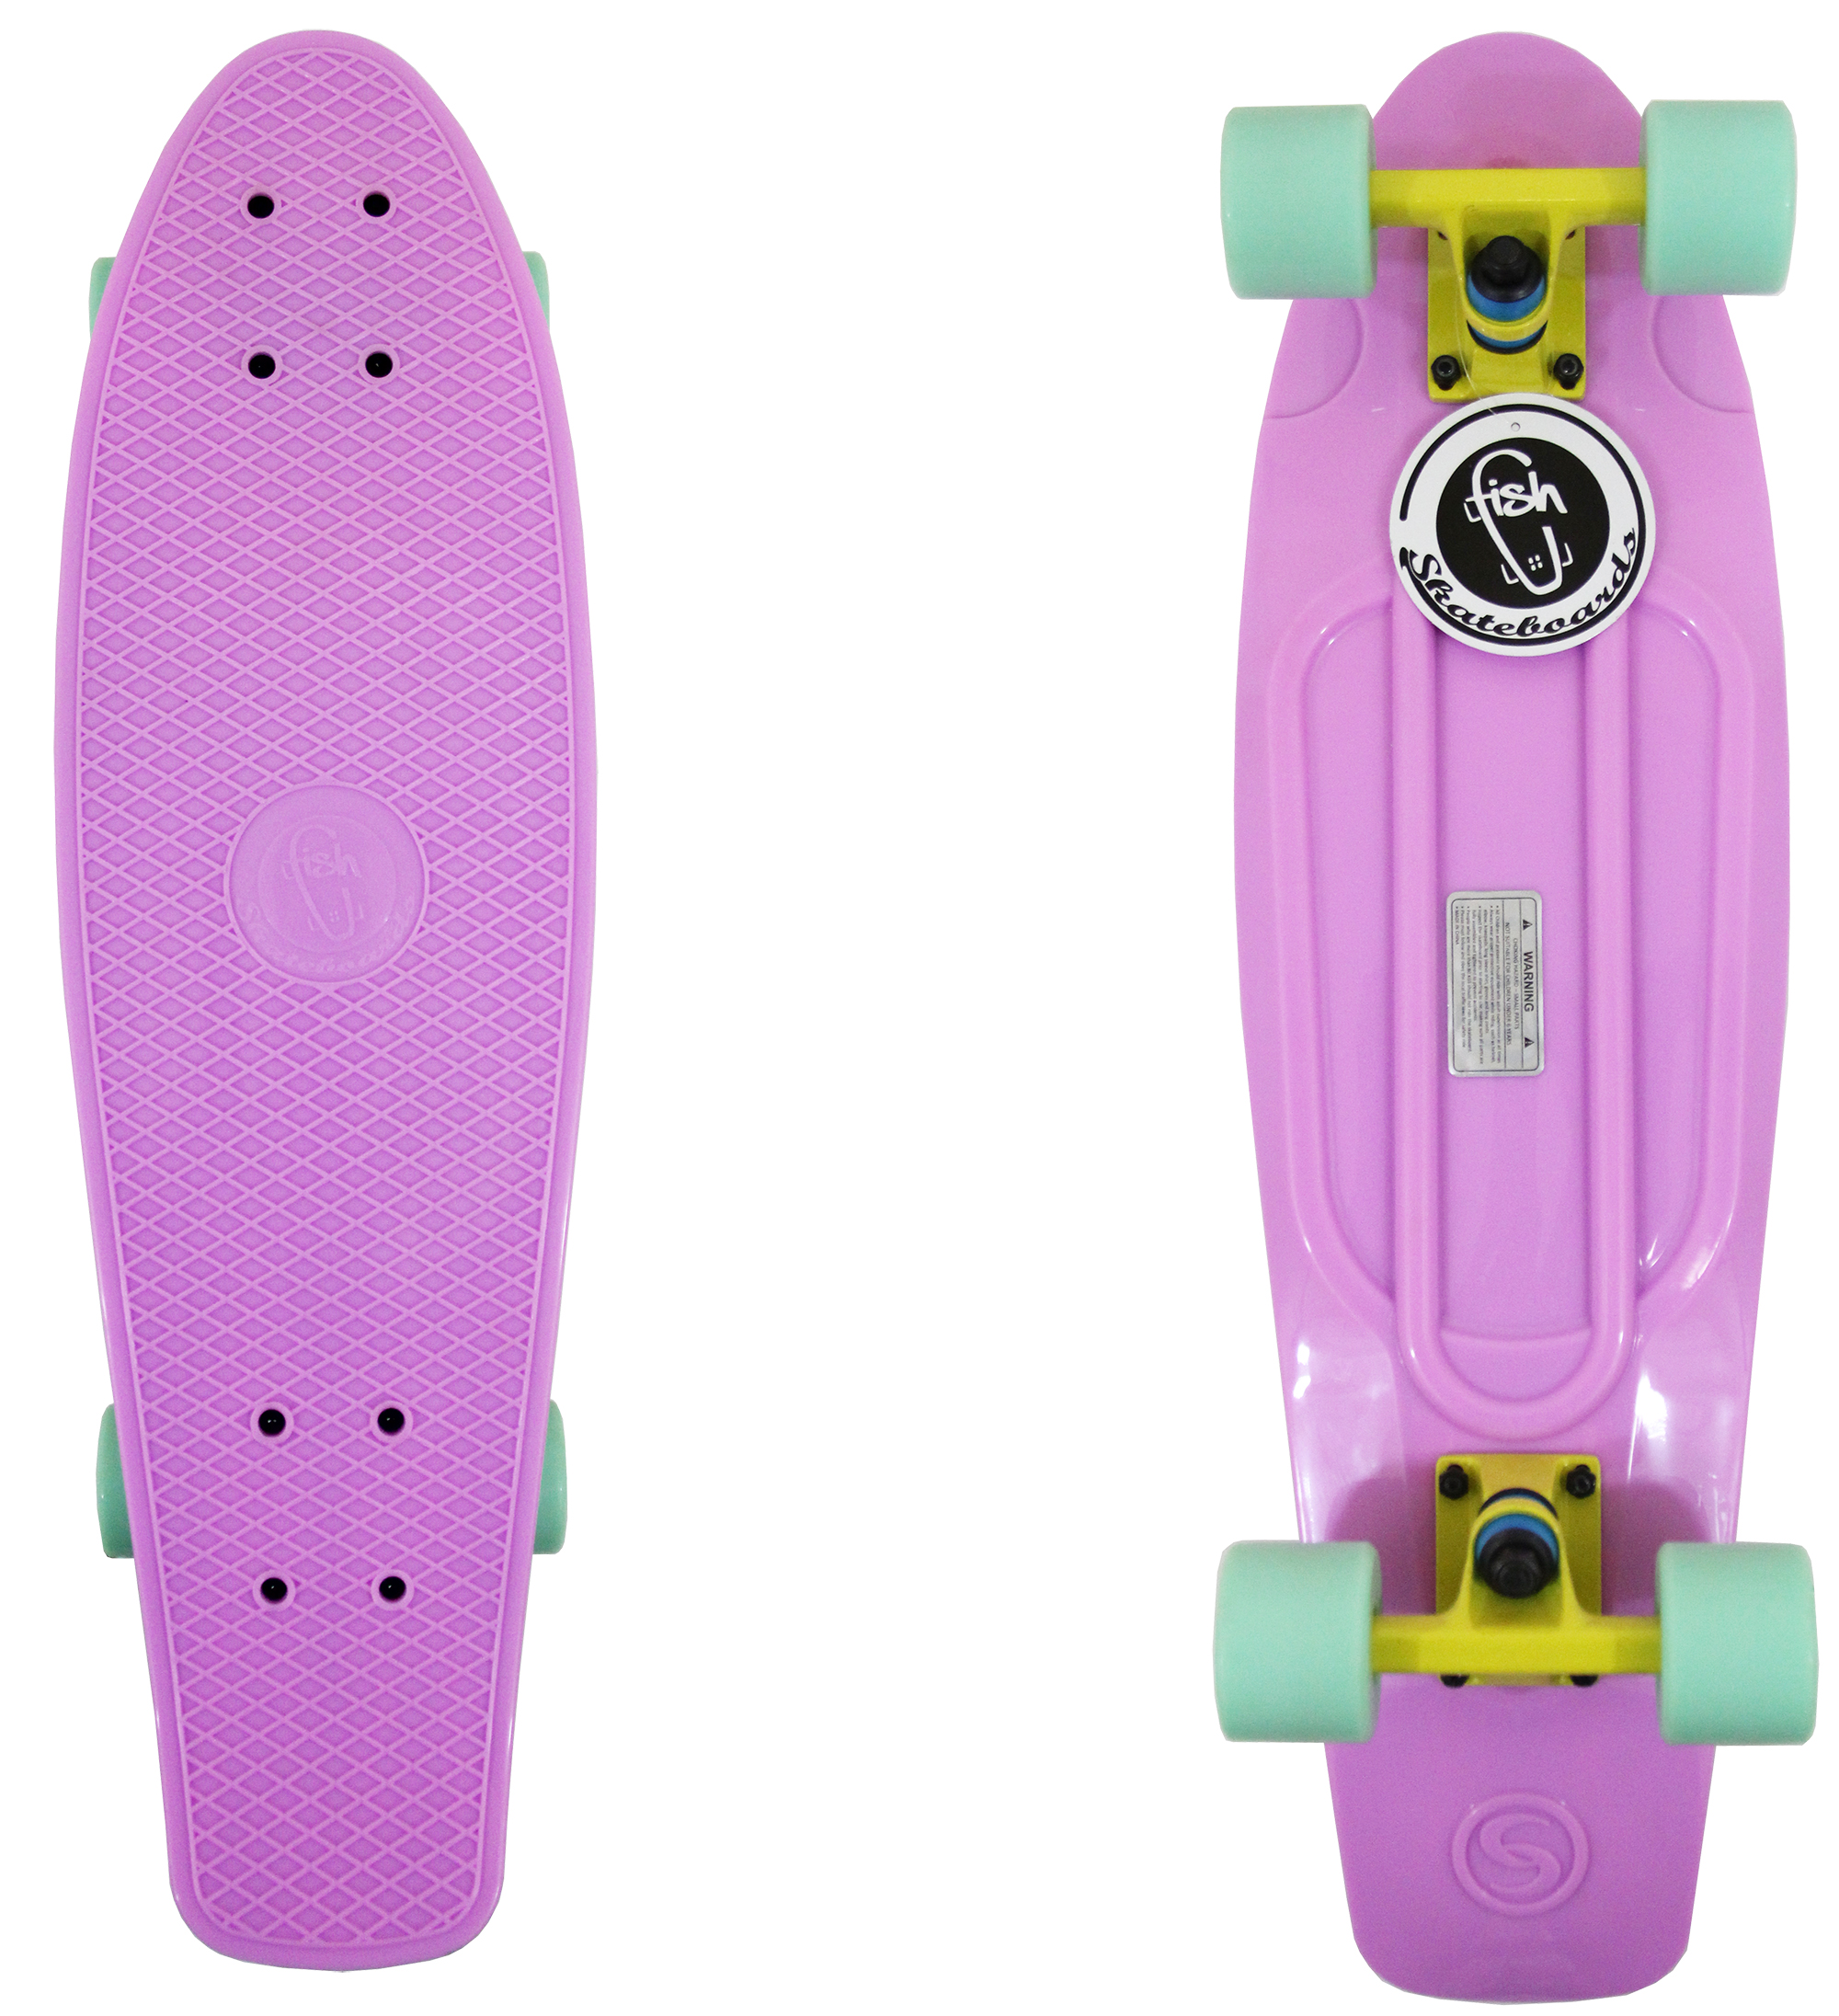 27 Quot Shark Retro Longboard Skateboard Plastic Cruiser Vinyl